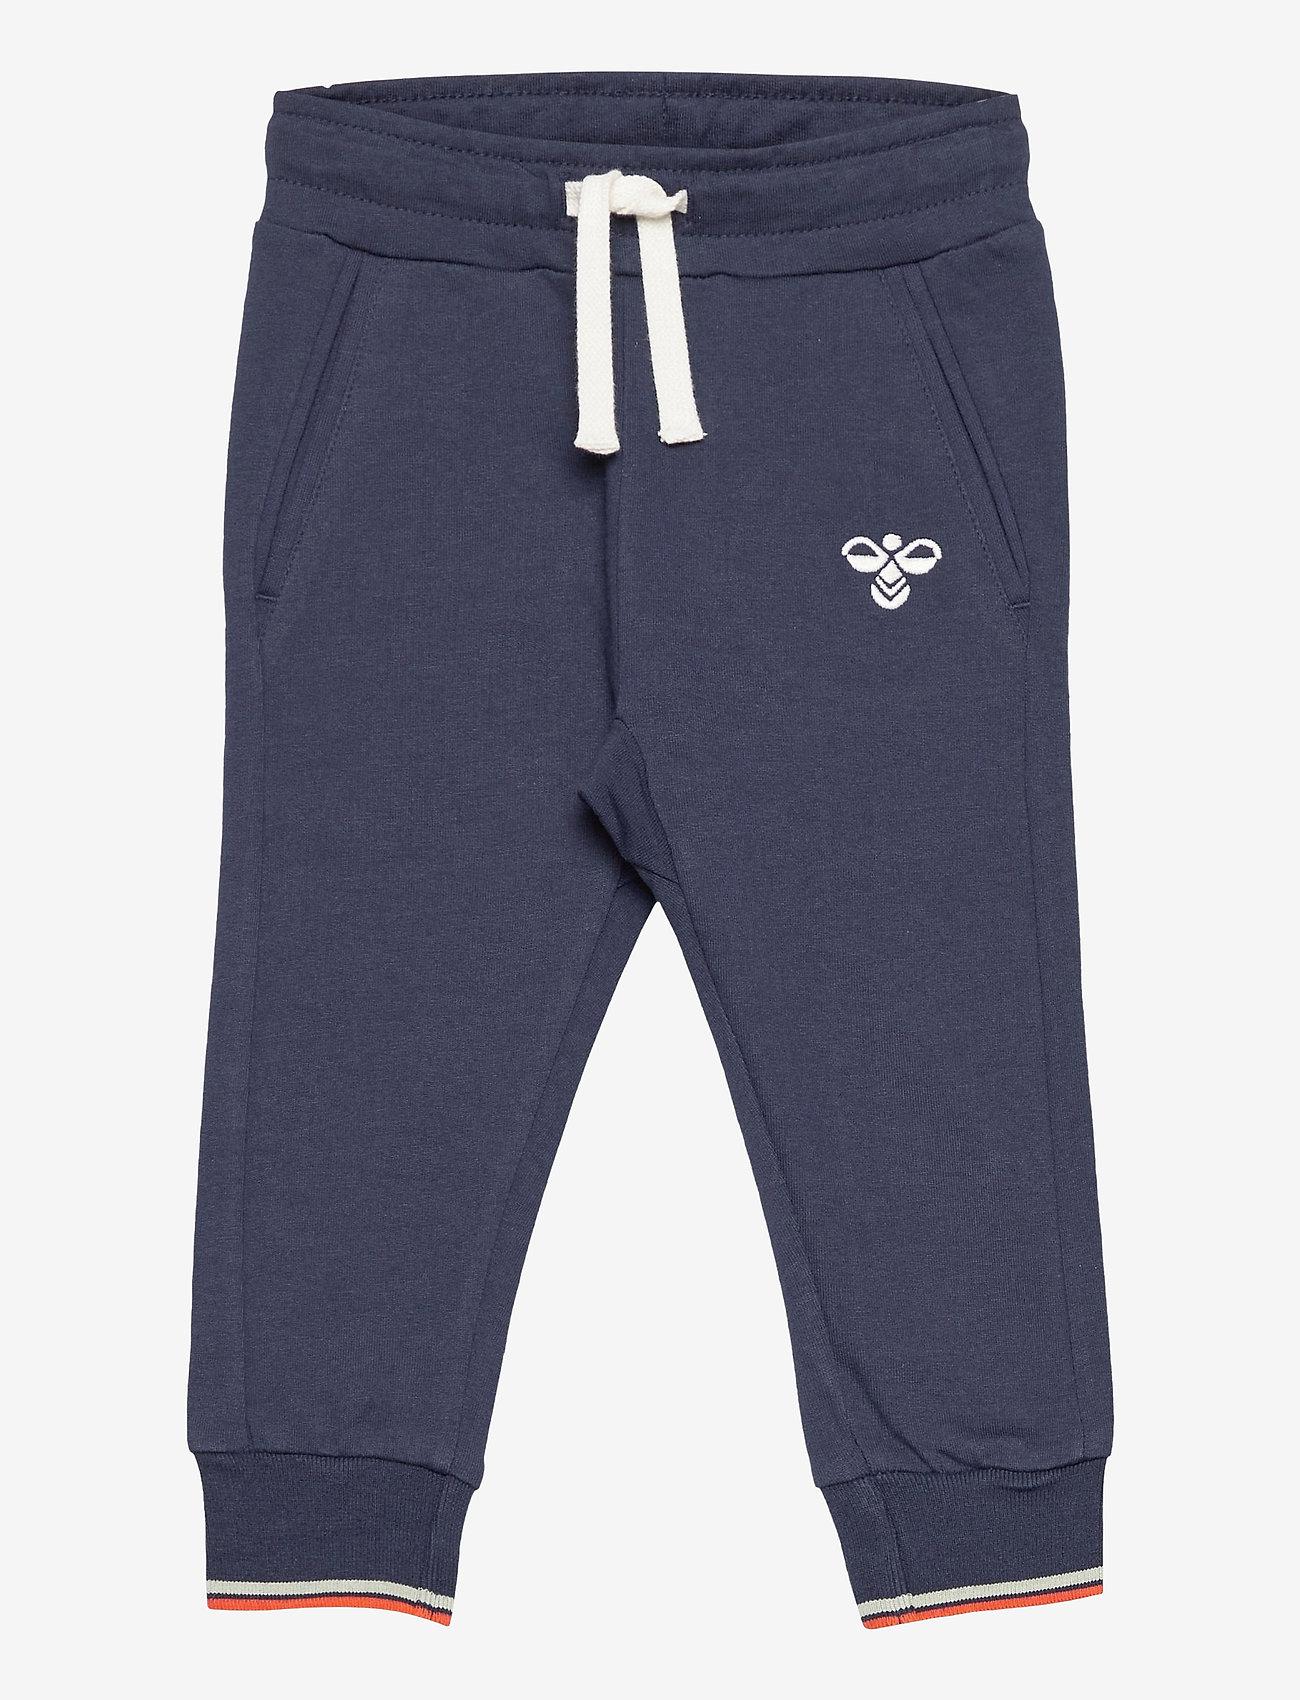 Hummel - hmlCARL PANTS - sweatpants - black iris - 0